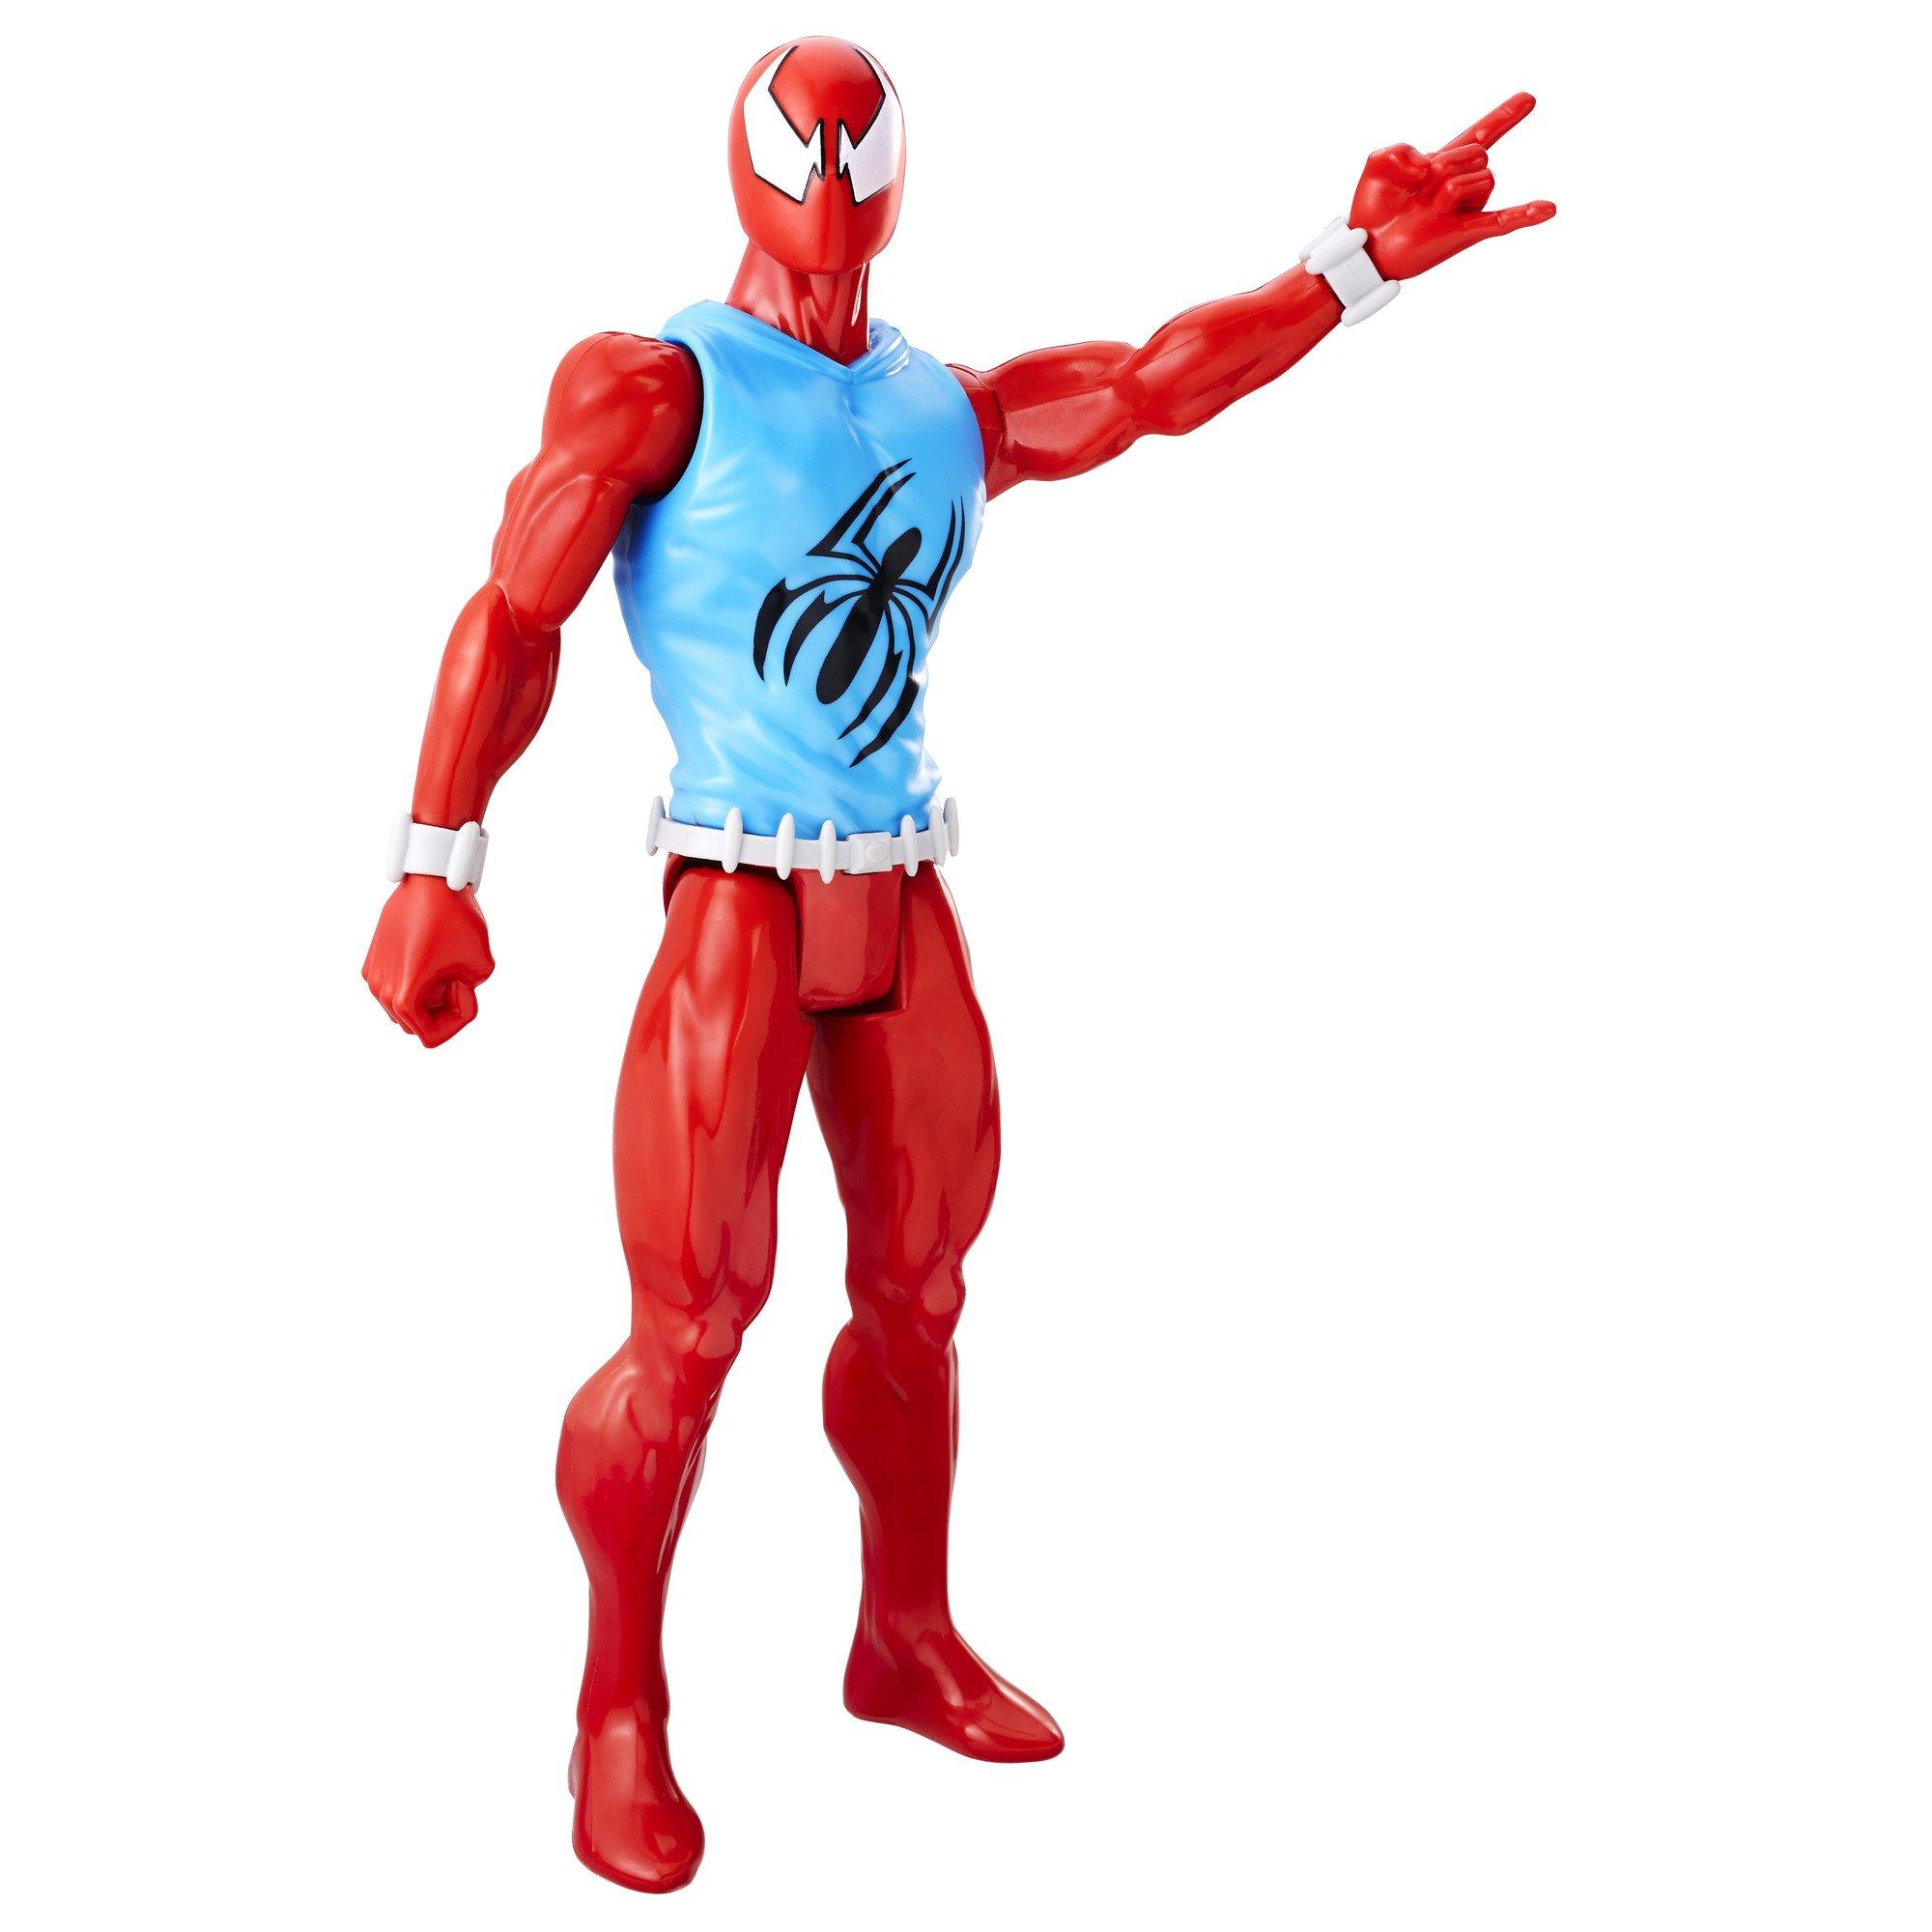 Marvel Spider Man Titan Hero Series Scarlet Spider Figure, Multi Color product image